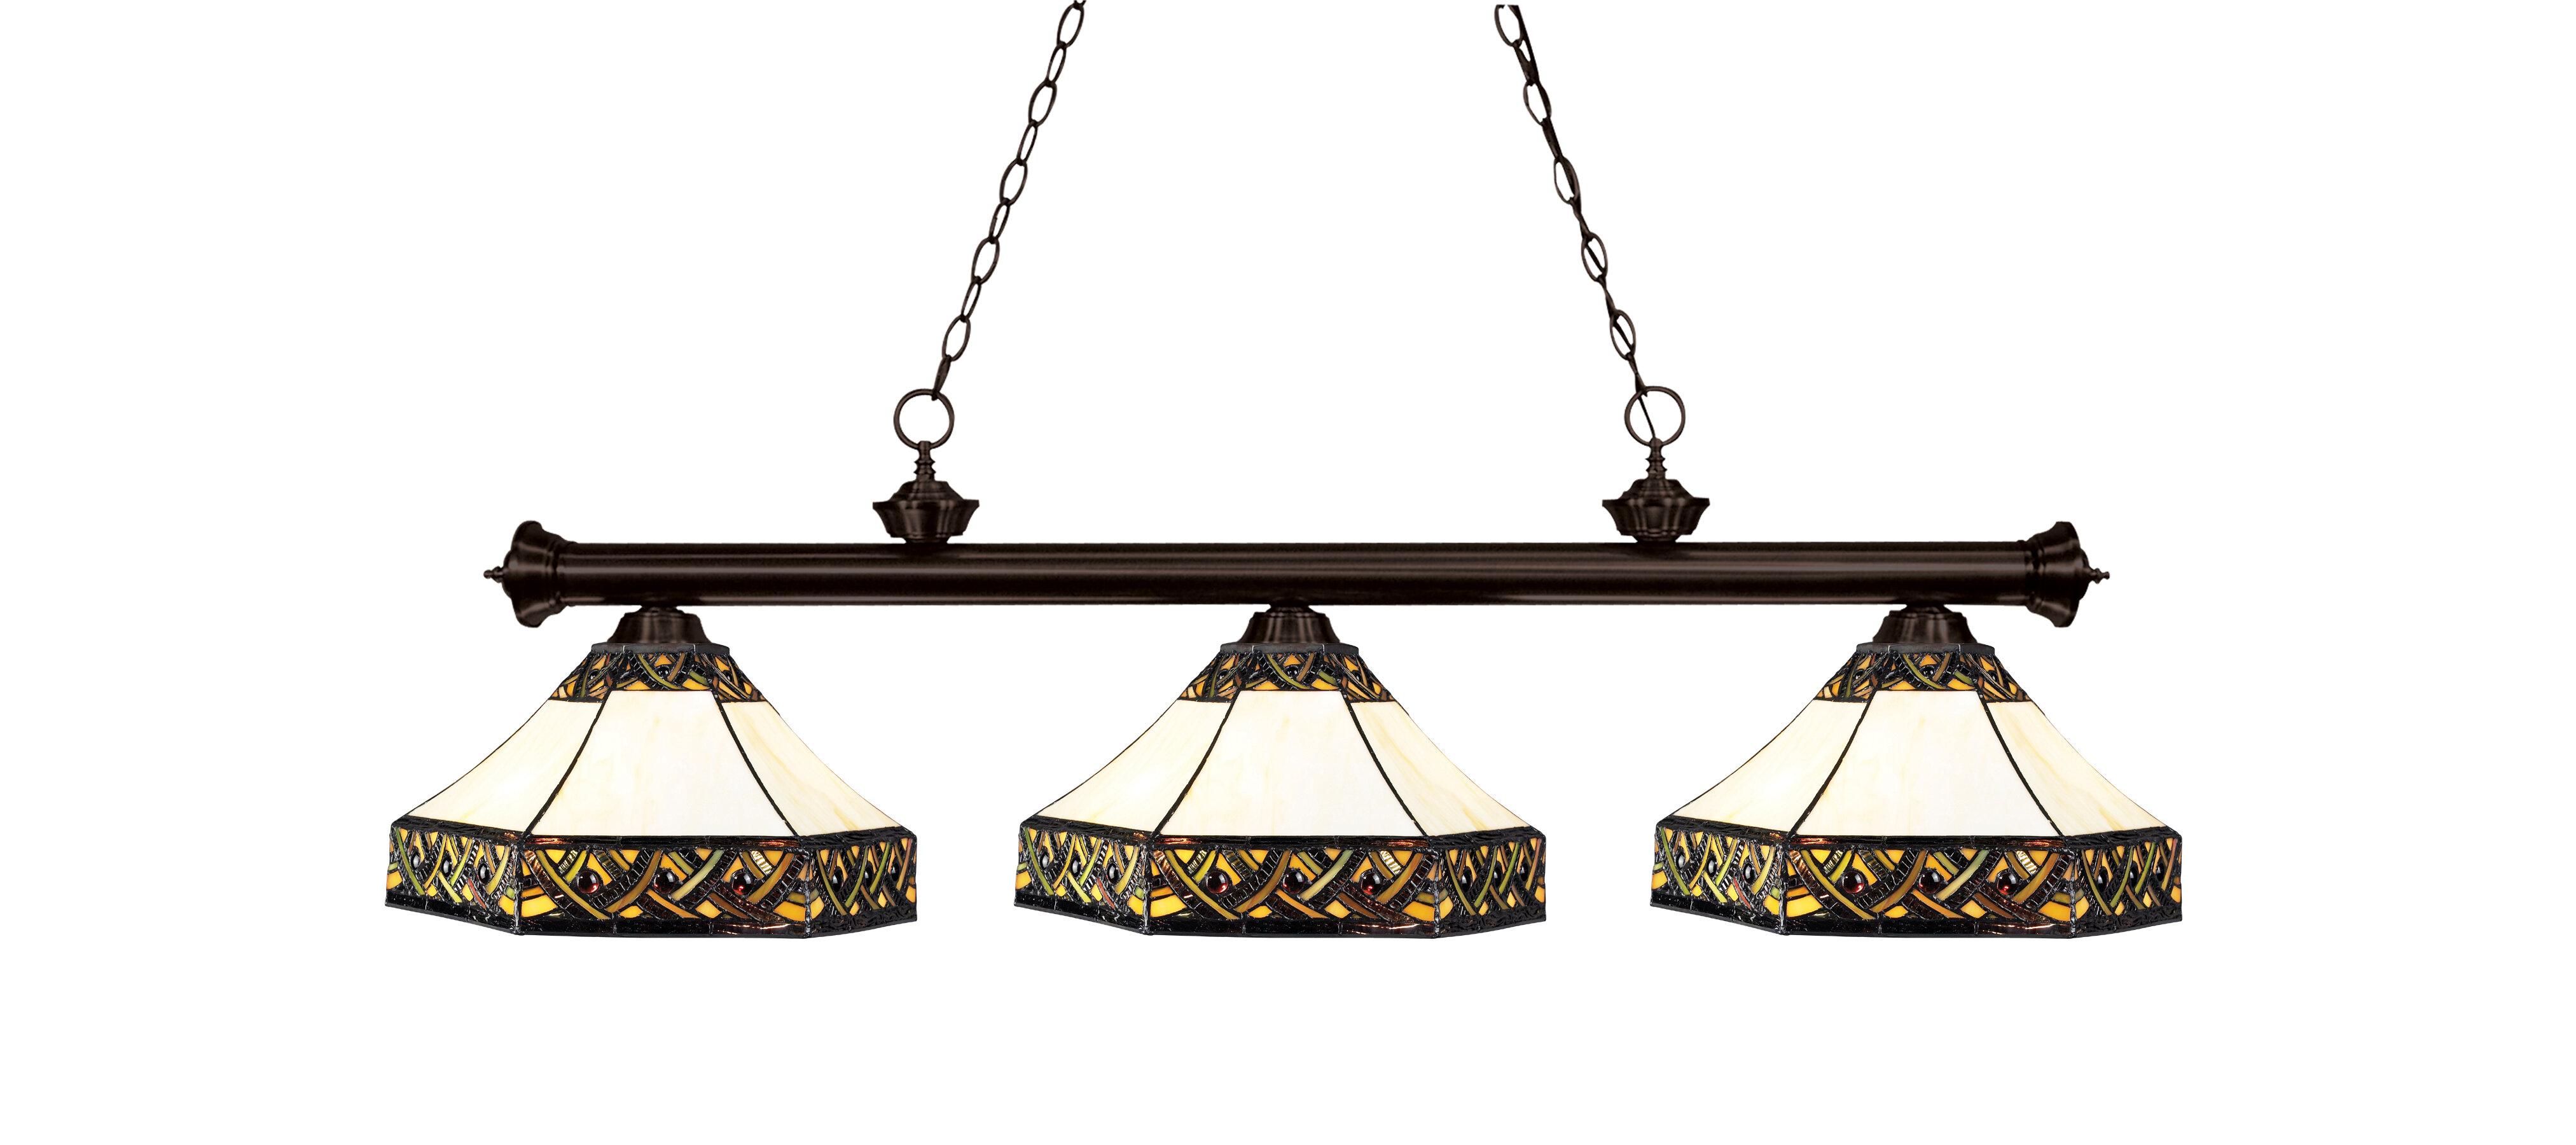 Fleur de lis living billiot bronze 3 light pool table lights pendant wayfair ca